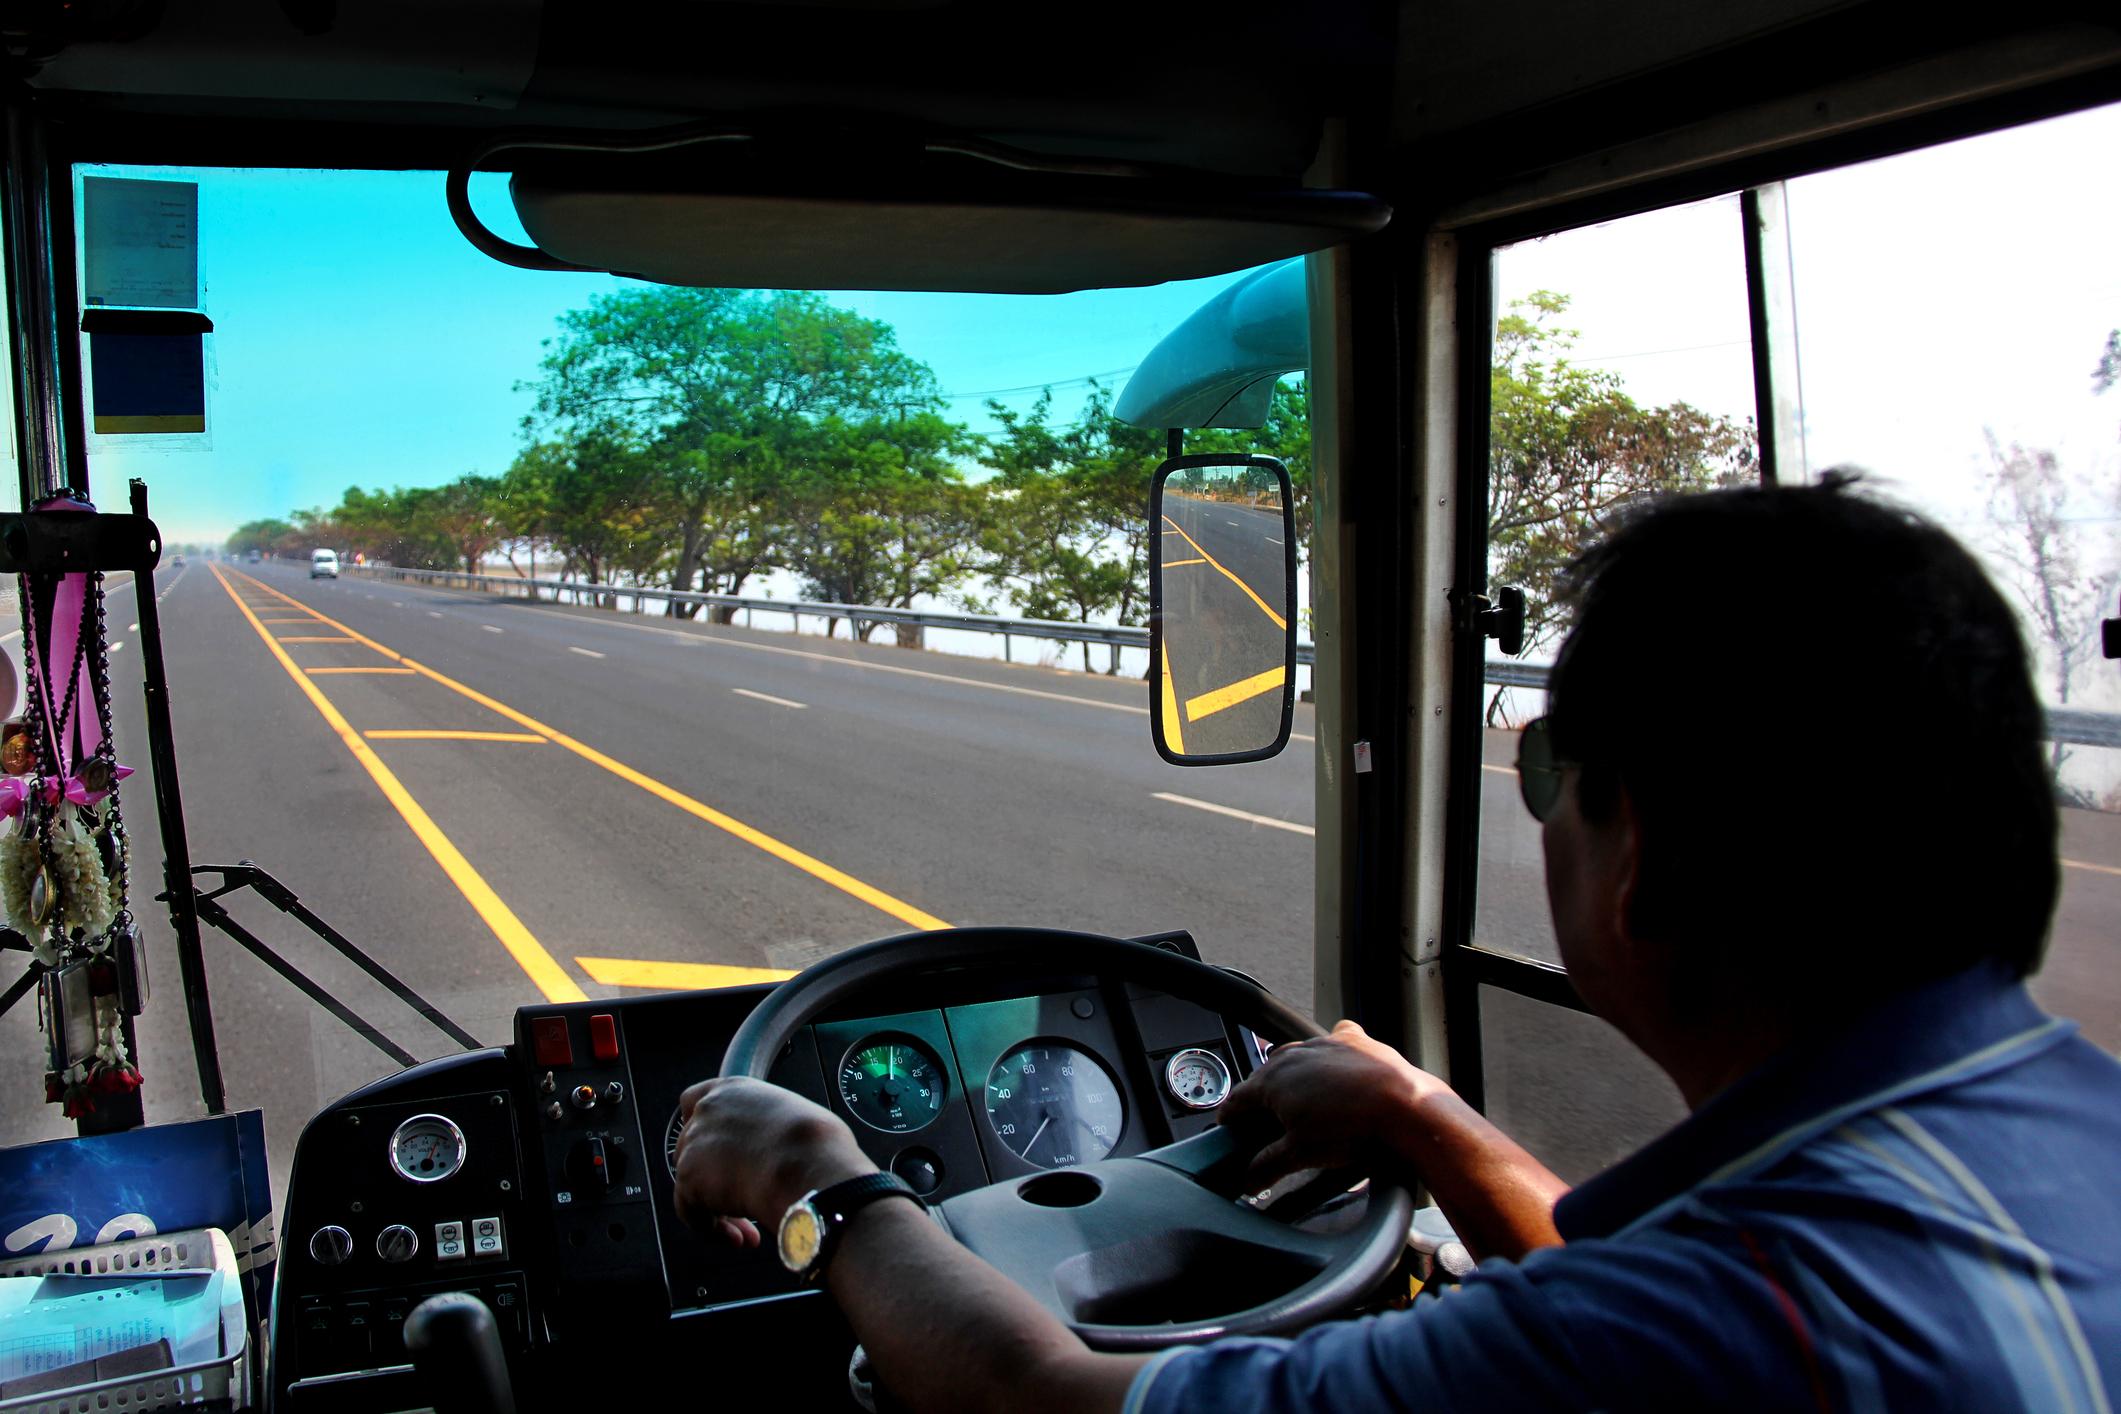 © niwat pravisarat lorry driver66496342